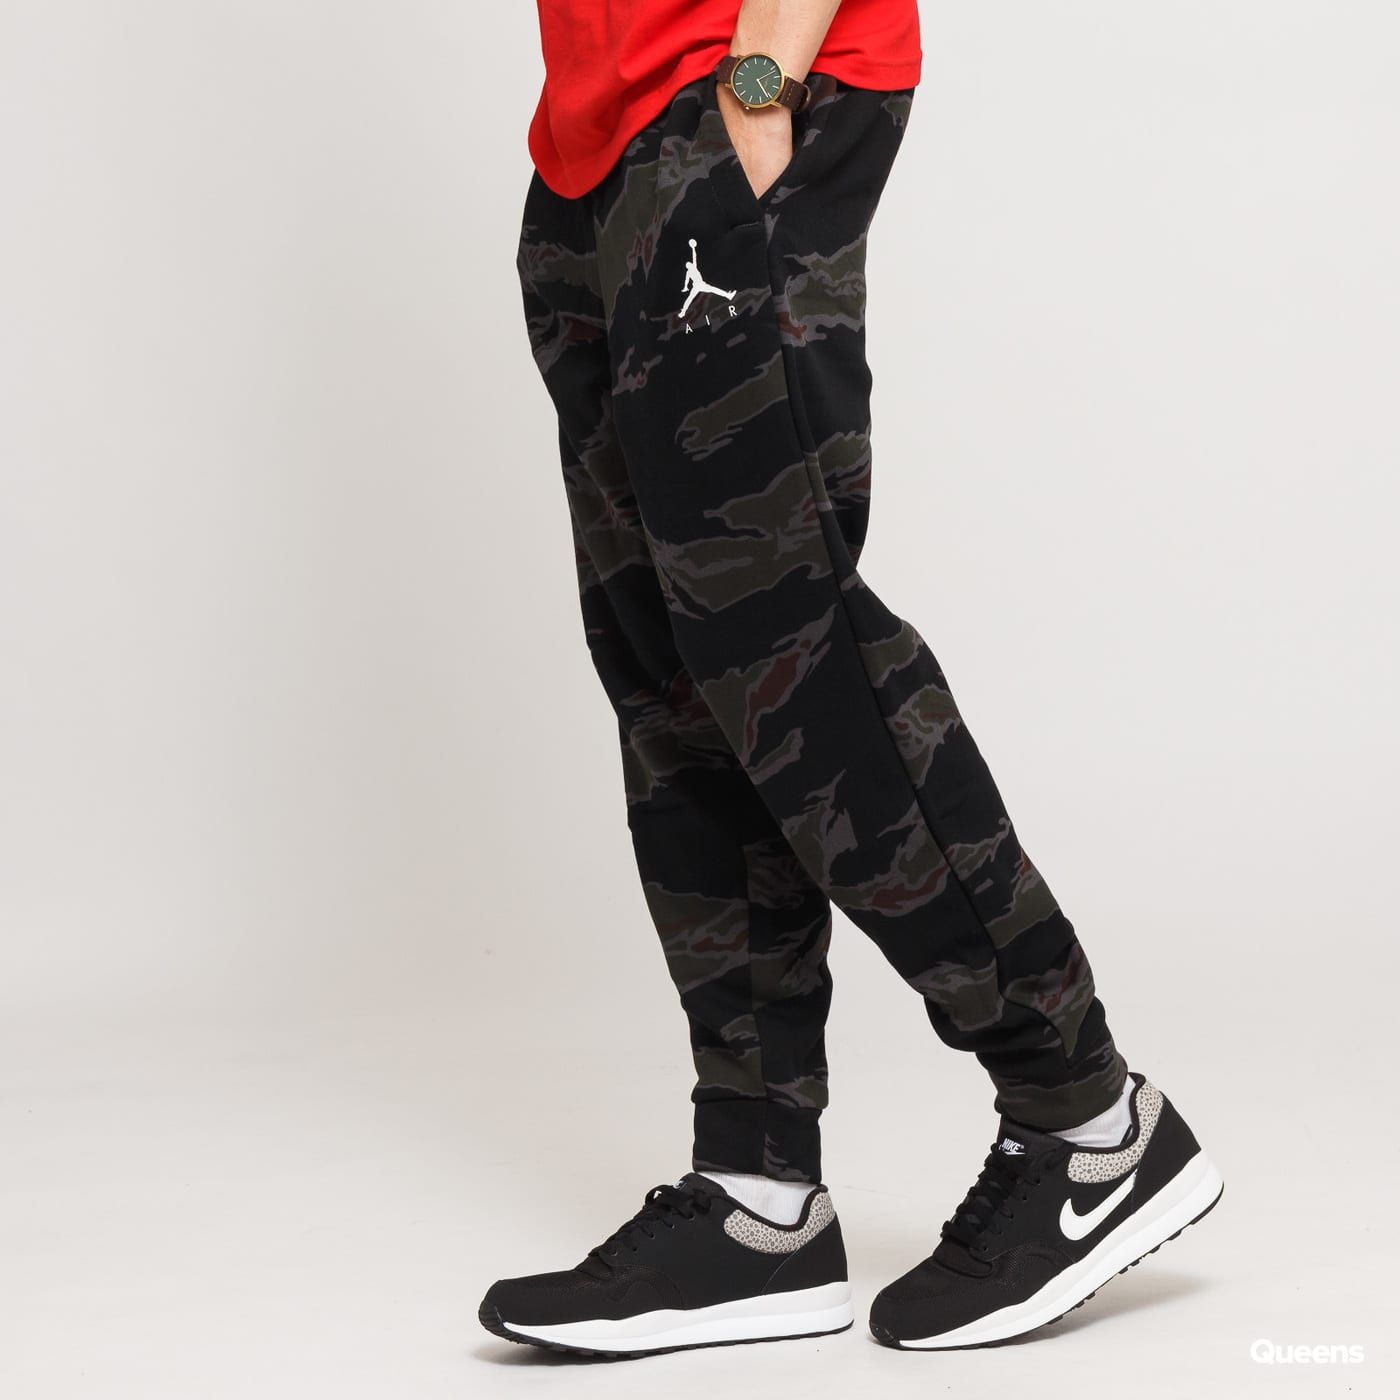 05e2141f7ac0 Zoom in Zoom in Zoom in Zoom in Zoom in Zoom in. Jordan Jumpman Fleece Camo  pant ...